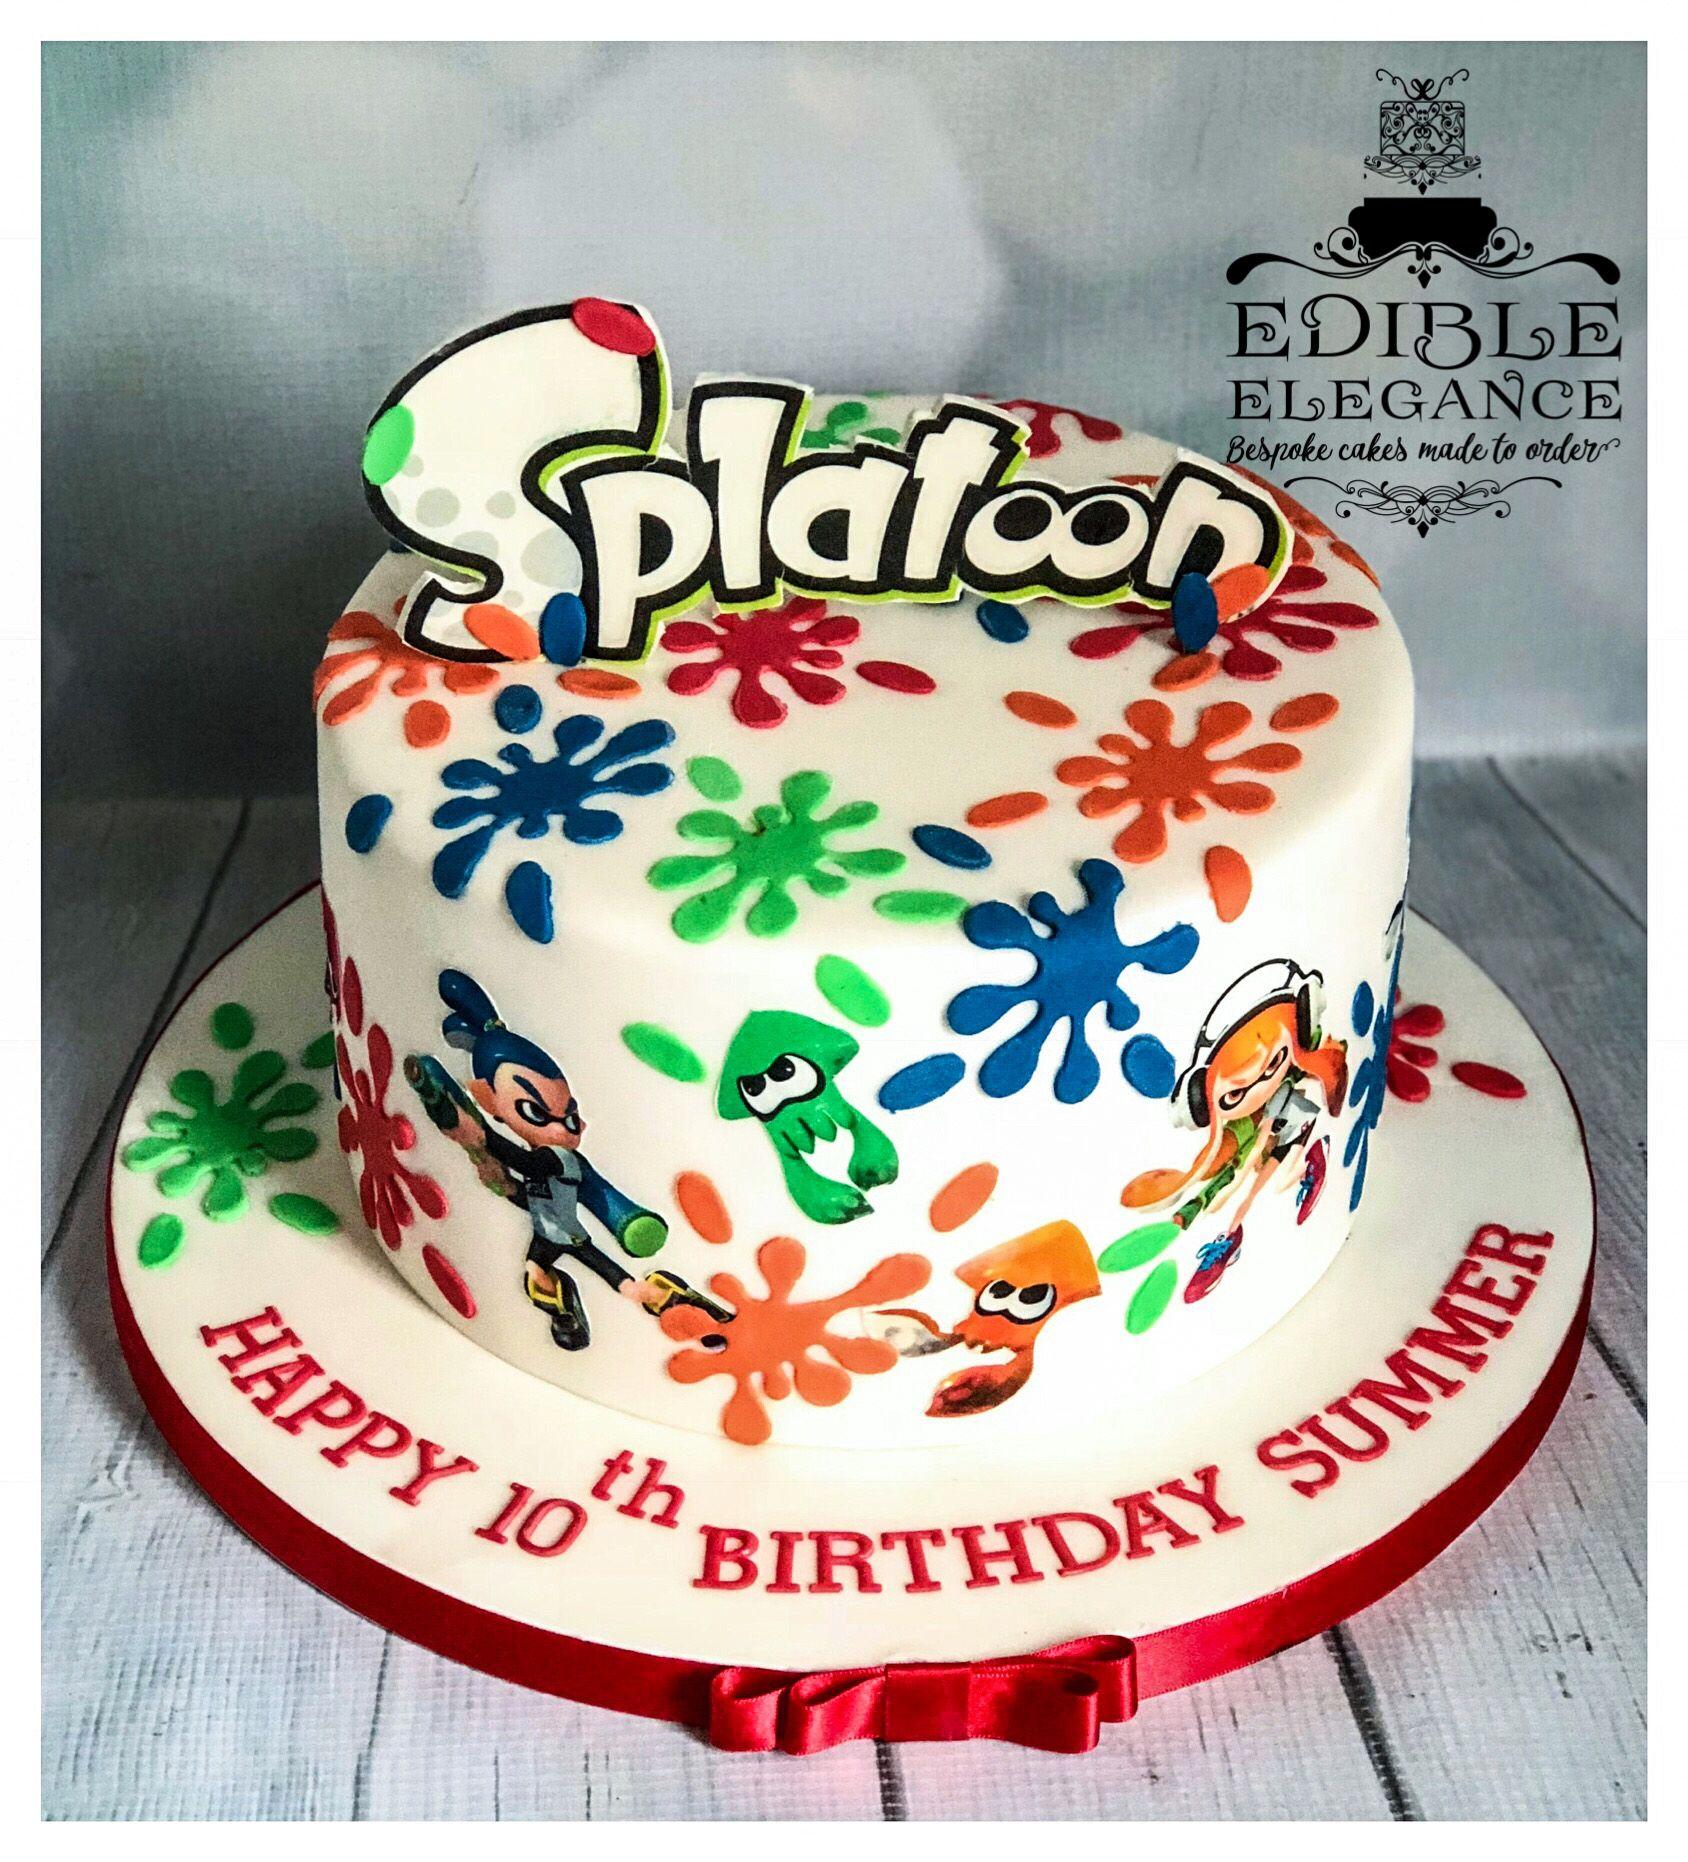 Splatoon Cake In 2019 Cake Birthday Party Decorations